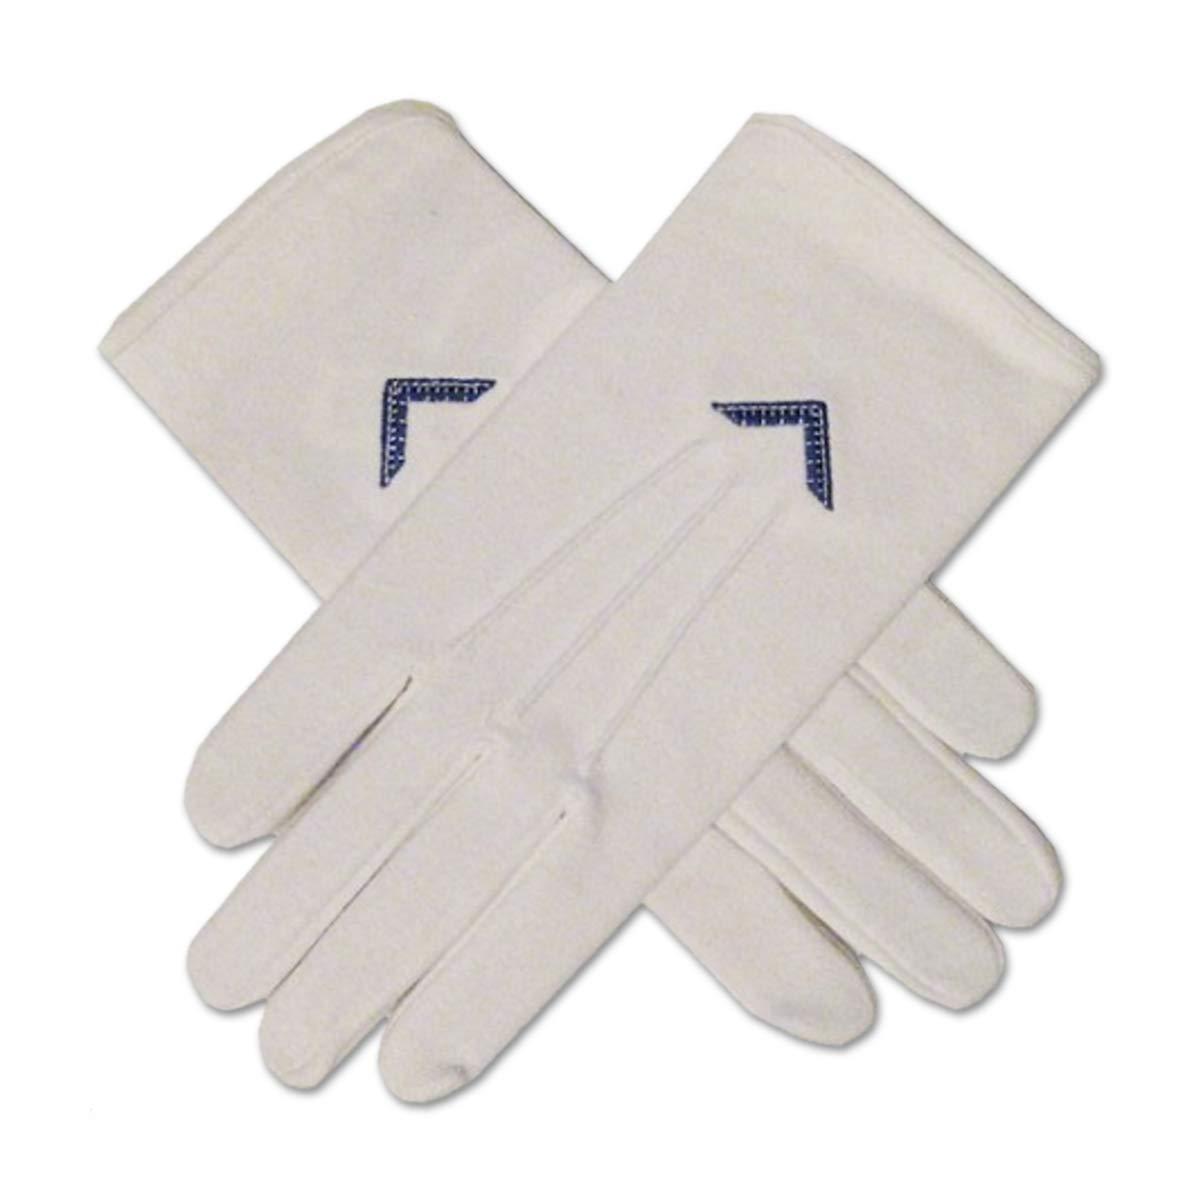 Masonic Royal Arch Hand Embroidered Freemason White Gloves